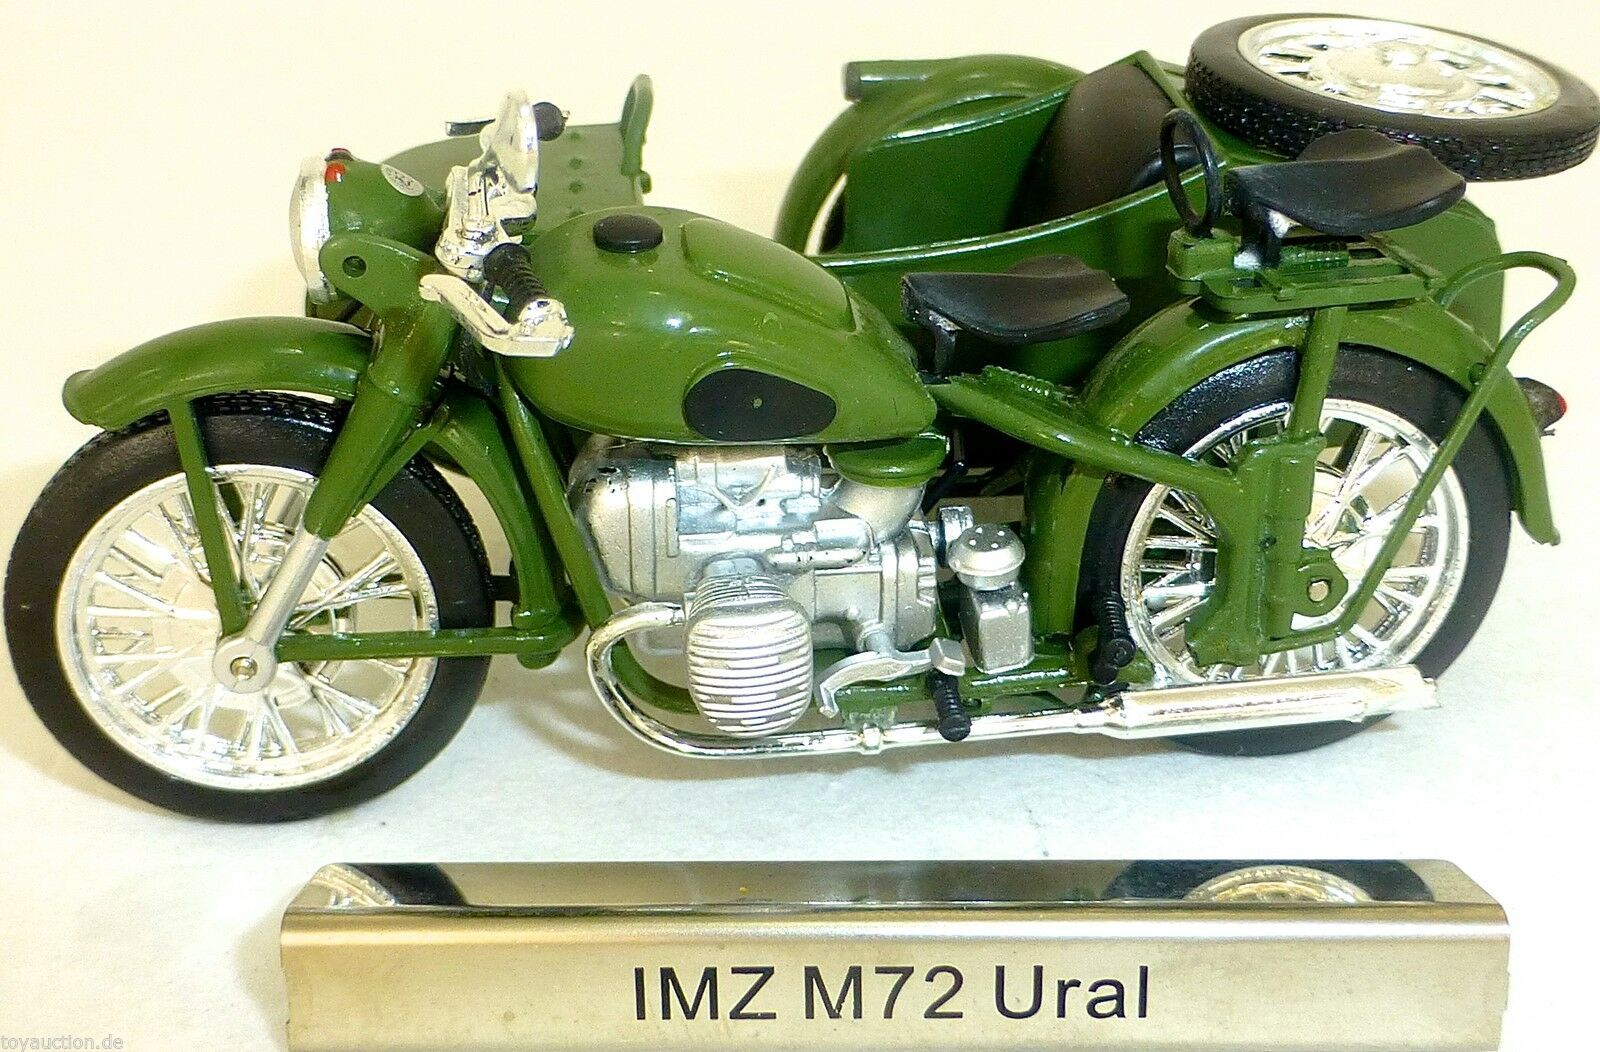 Imz M72 Ural Motorcycle Passenger Car Green GDR 1 24 Atlas 7168121 Nip LA2 Μ